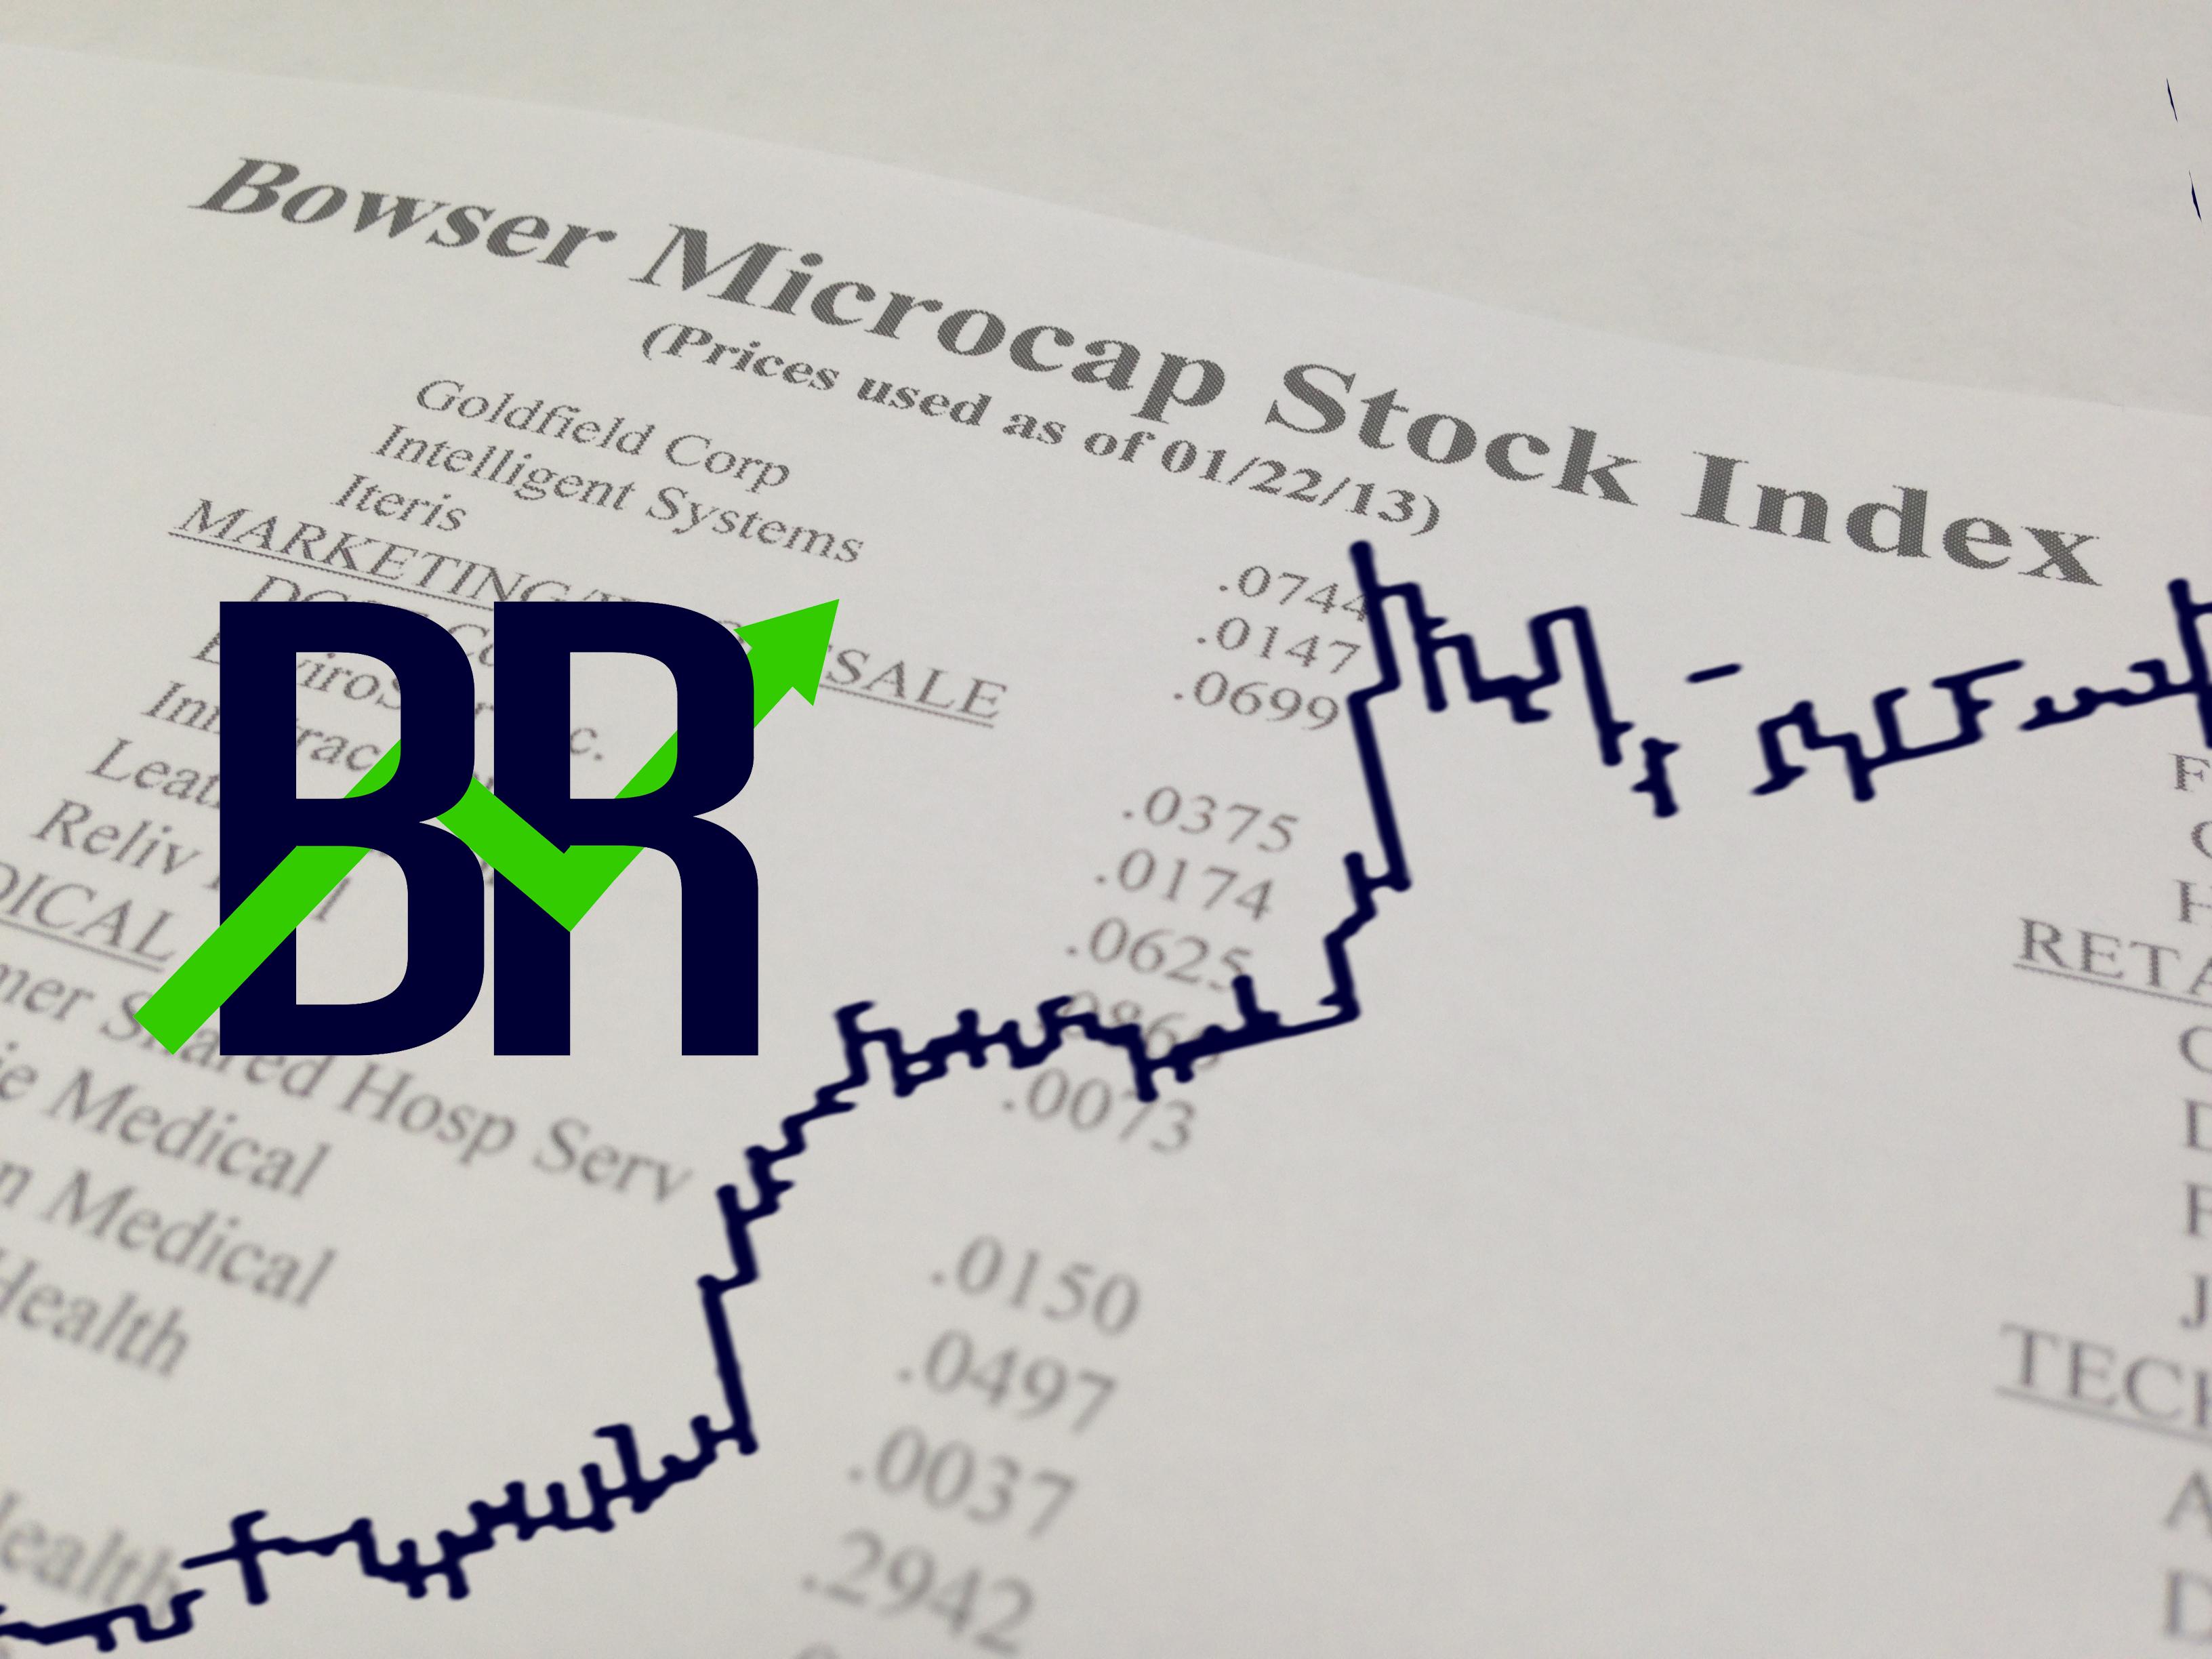 Bowser Microcap Stock Index